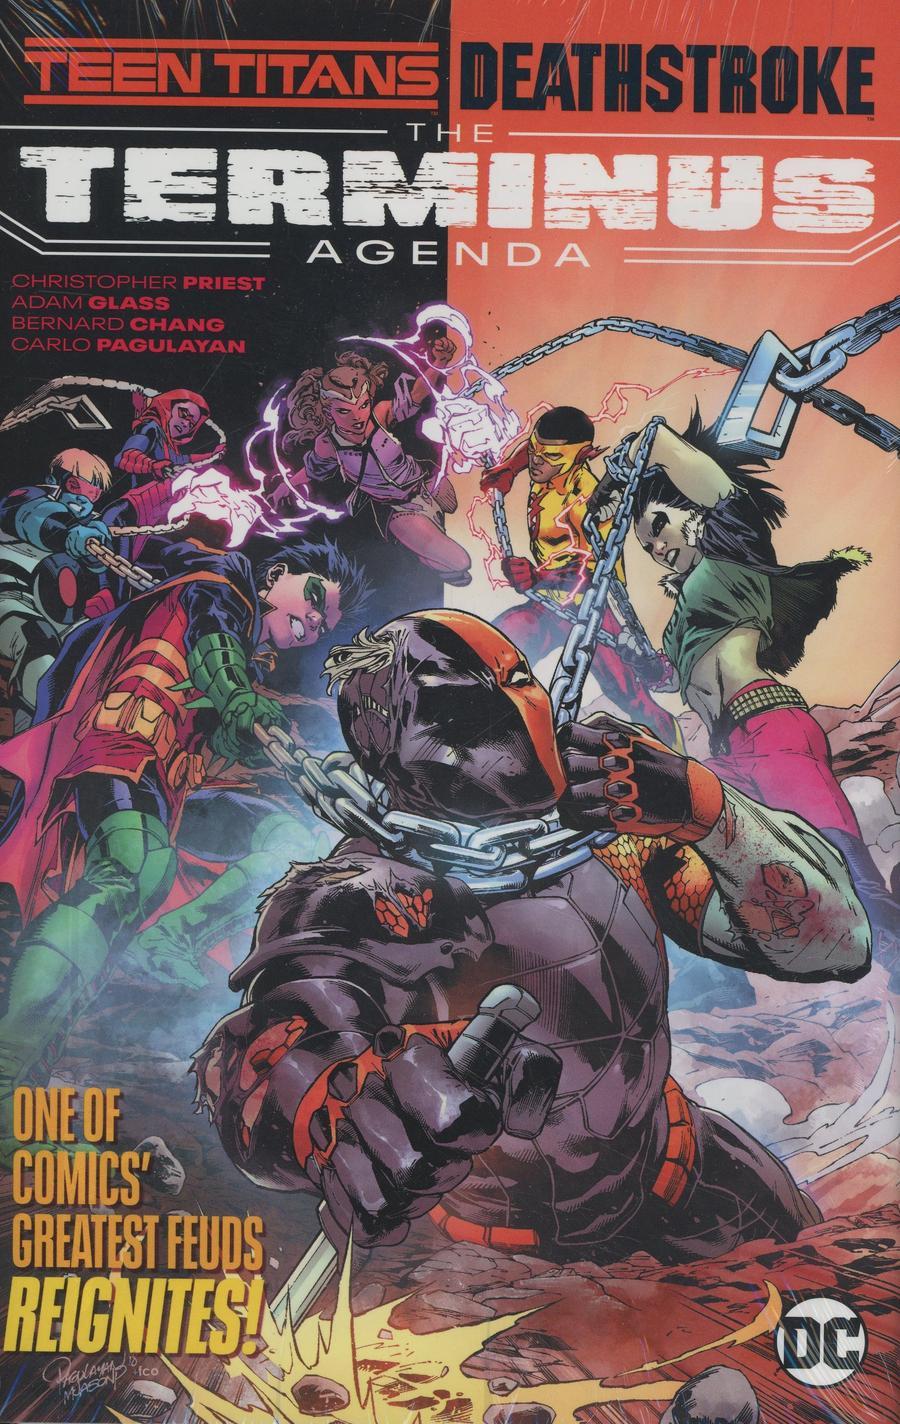 Teen Titans Deathstroke The Terminus Agenda HC